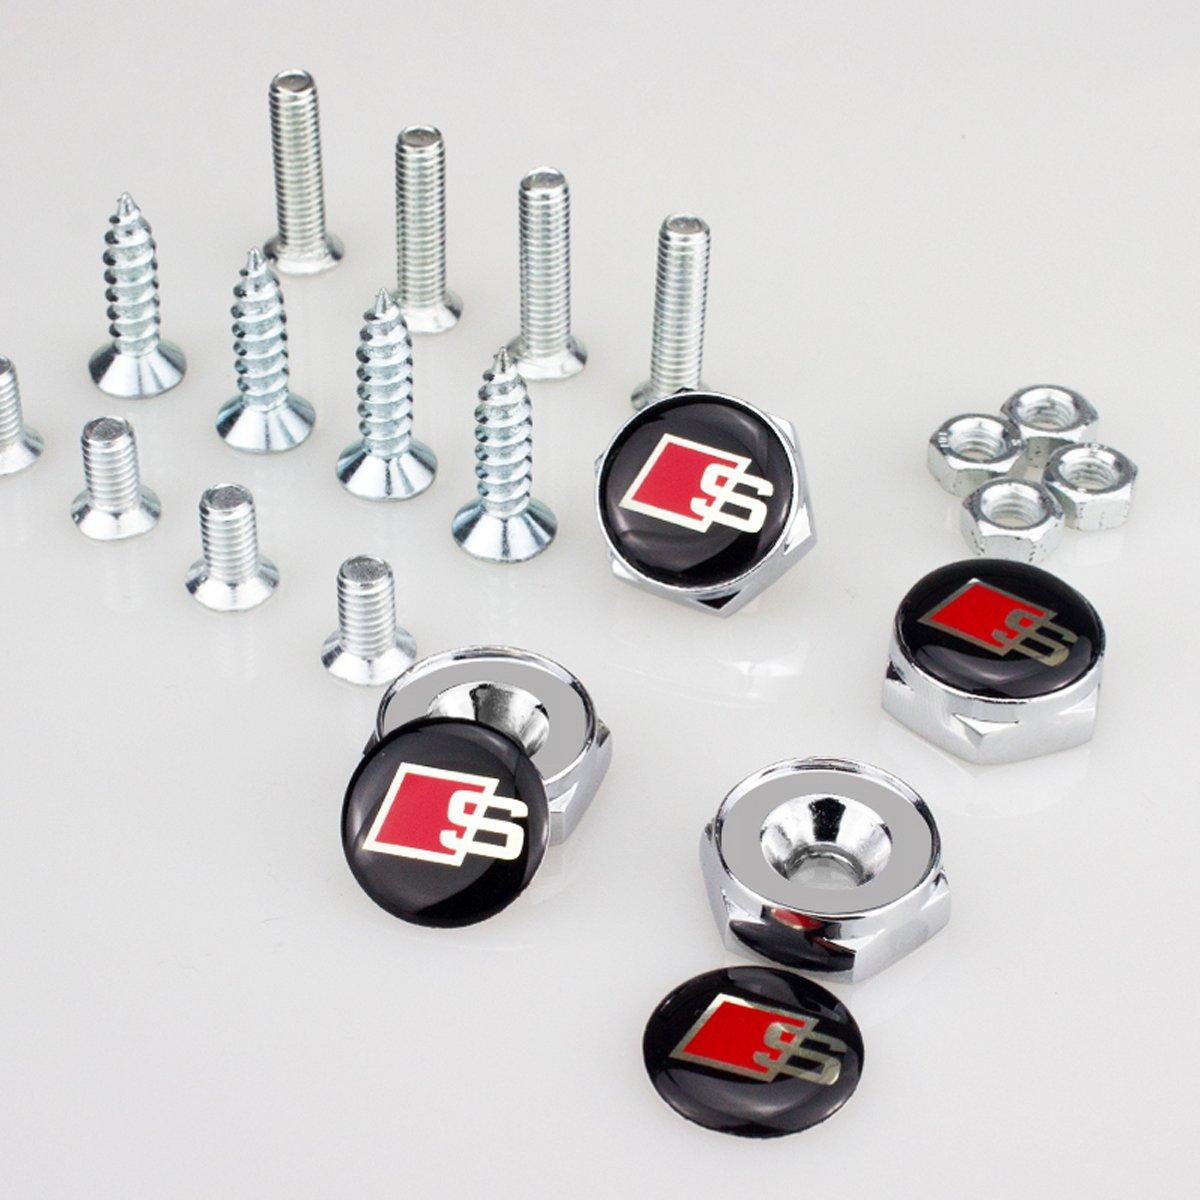 TK-KLZ 4Pcs for Audi S Line Logo Chrome Metal Sports Style Car License Plate Frame Universal Bolt Screws for ALL Model Audi S Line S3 S4 S5 S6 S7 S8 A1 A3 RS3 A4 A5 A6 A7 RS7 A8 Q3 Q5 Q7 R8 TT